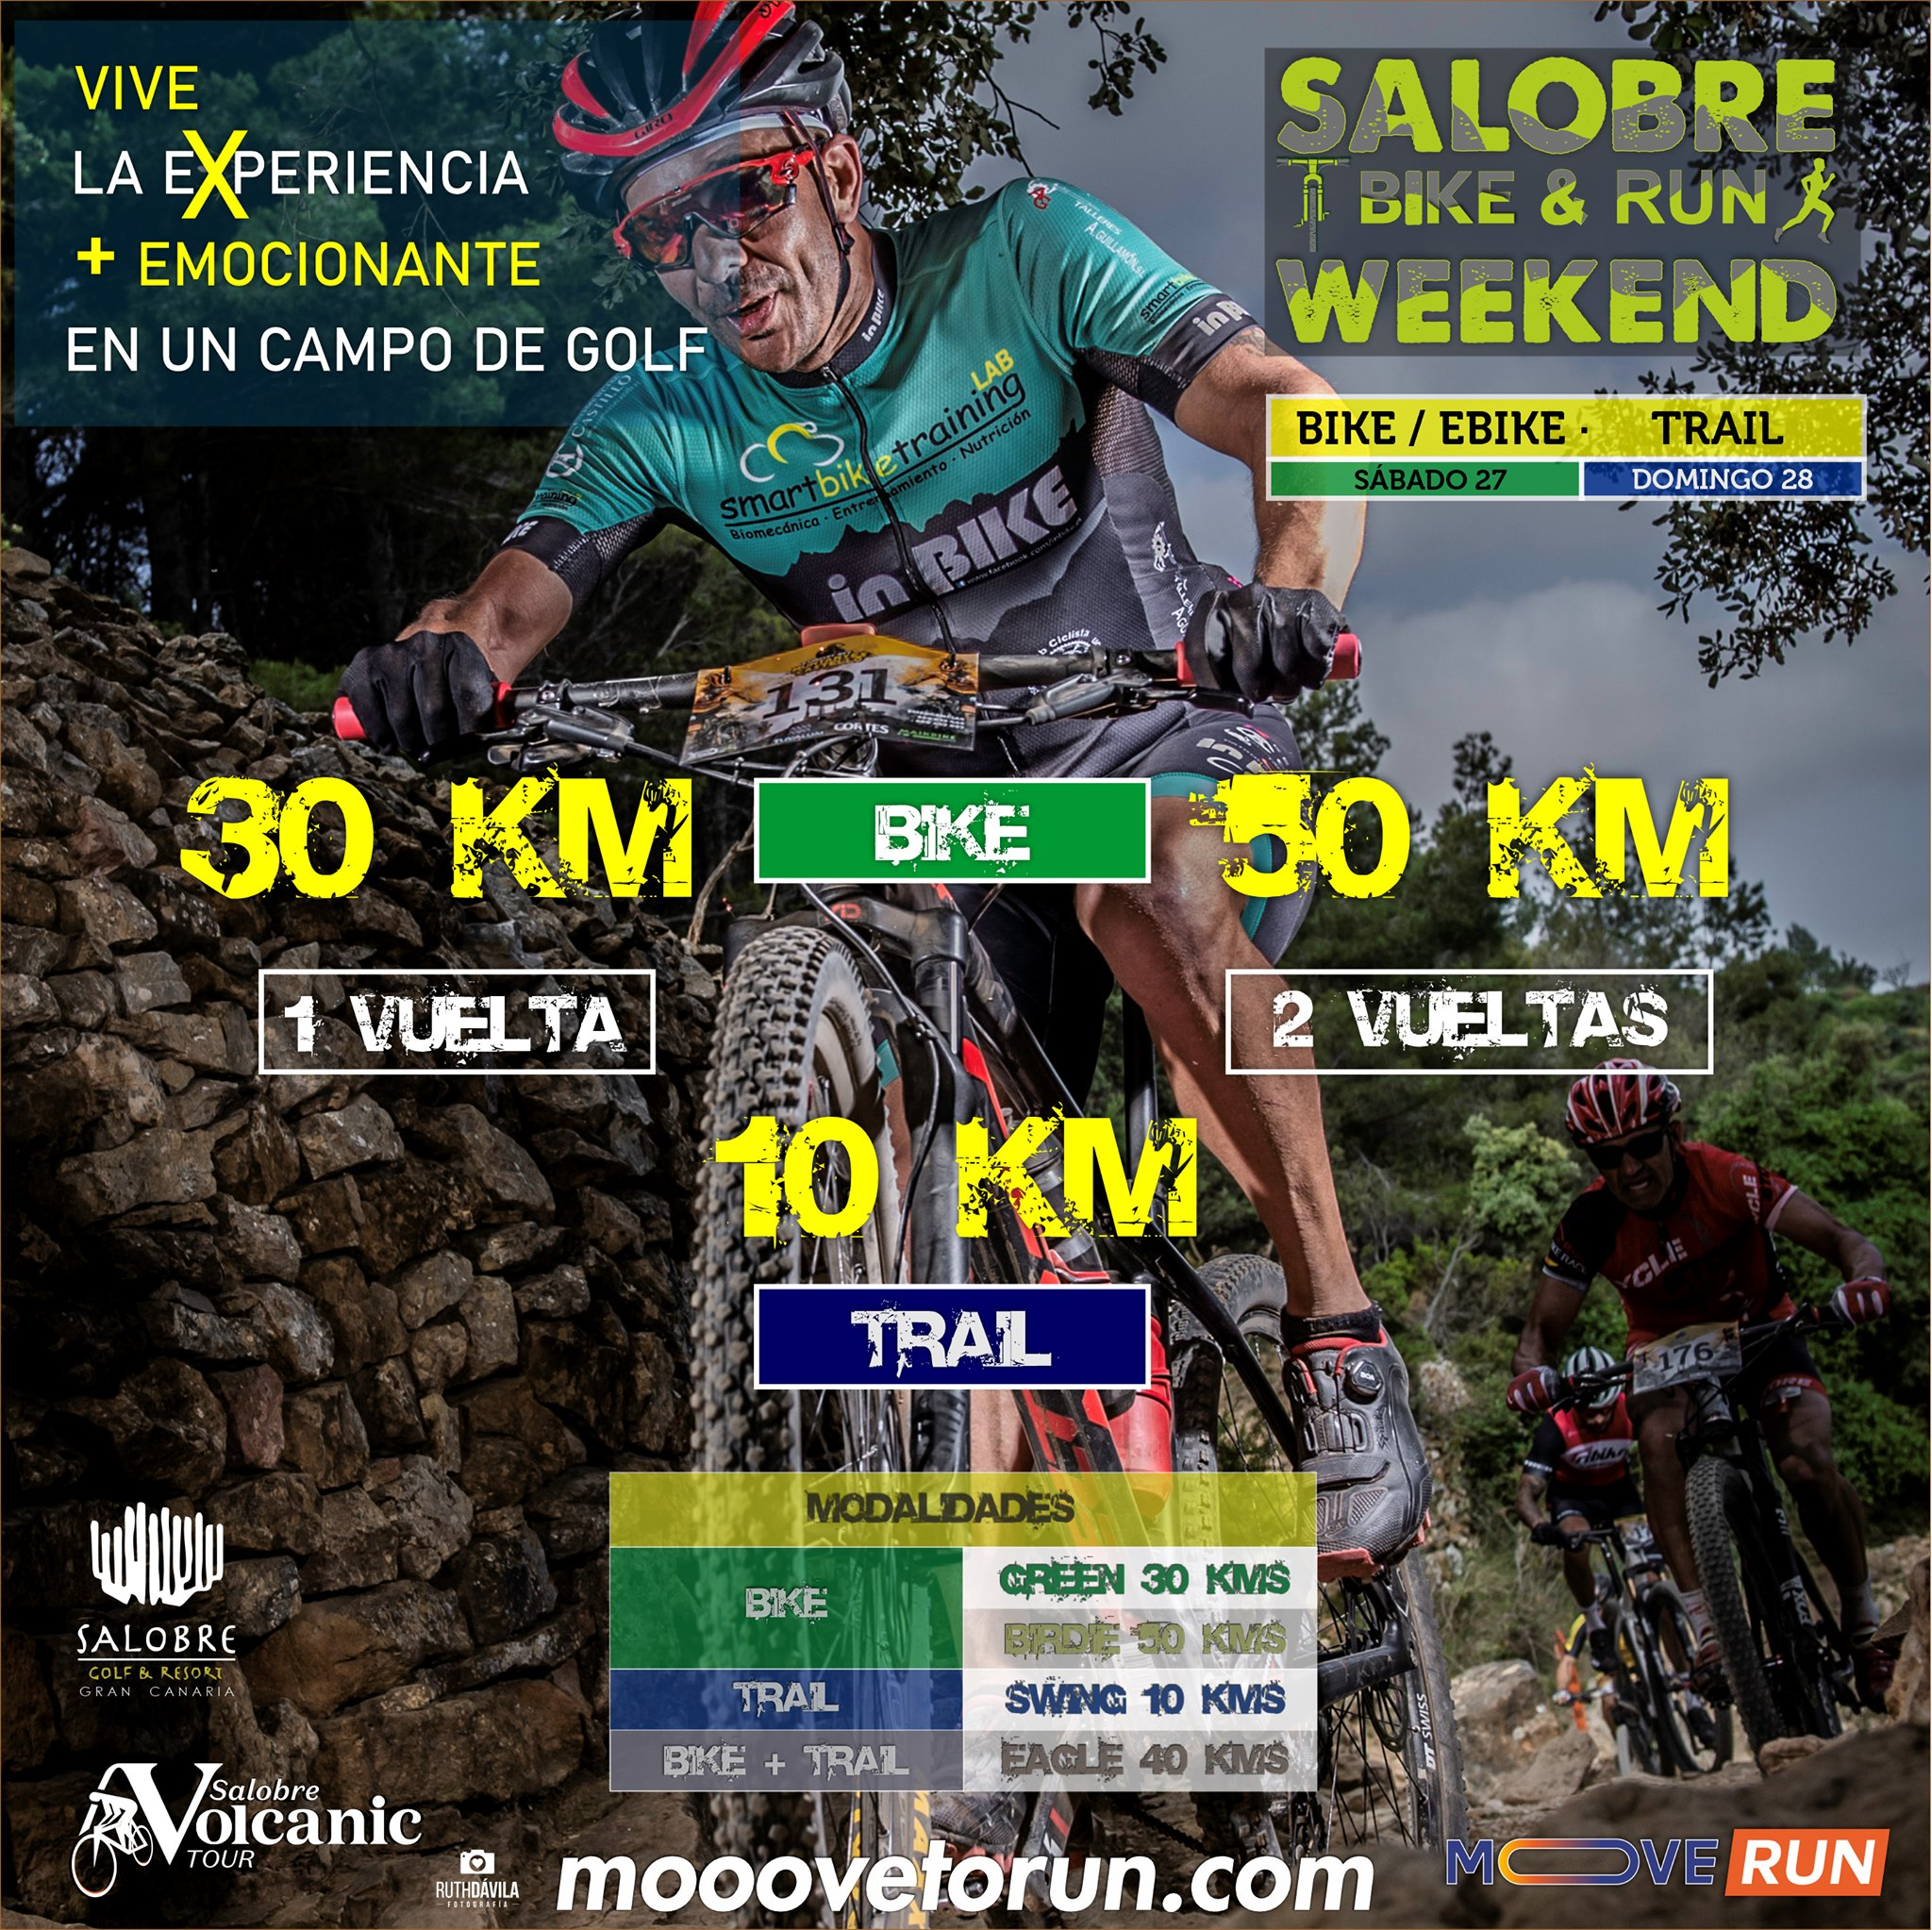 Cartel oficial de la Salobre BIKE&RUN Weekend 2021